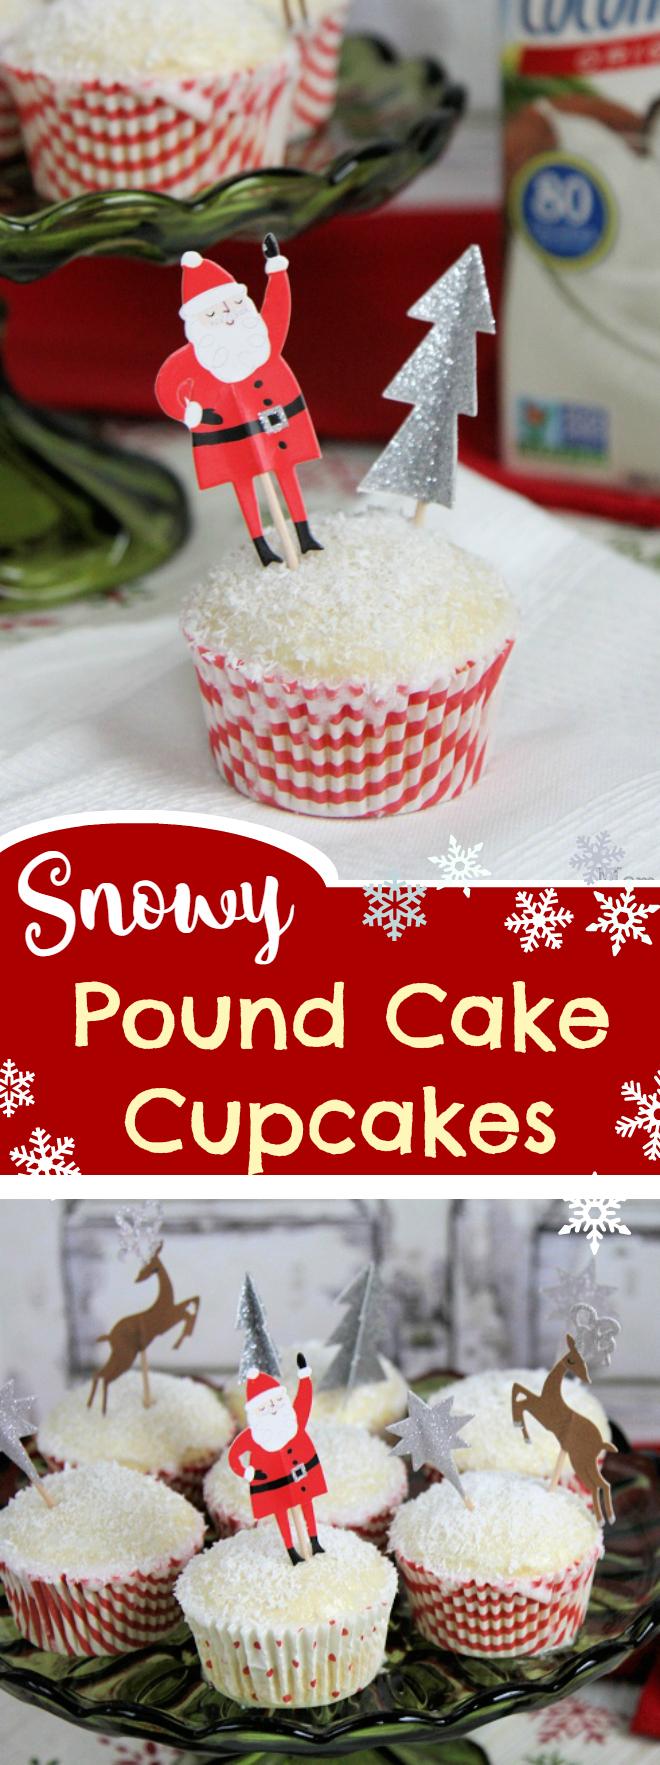 Snowy Coconut Poundcake Cupcakes